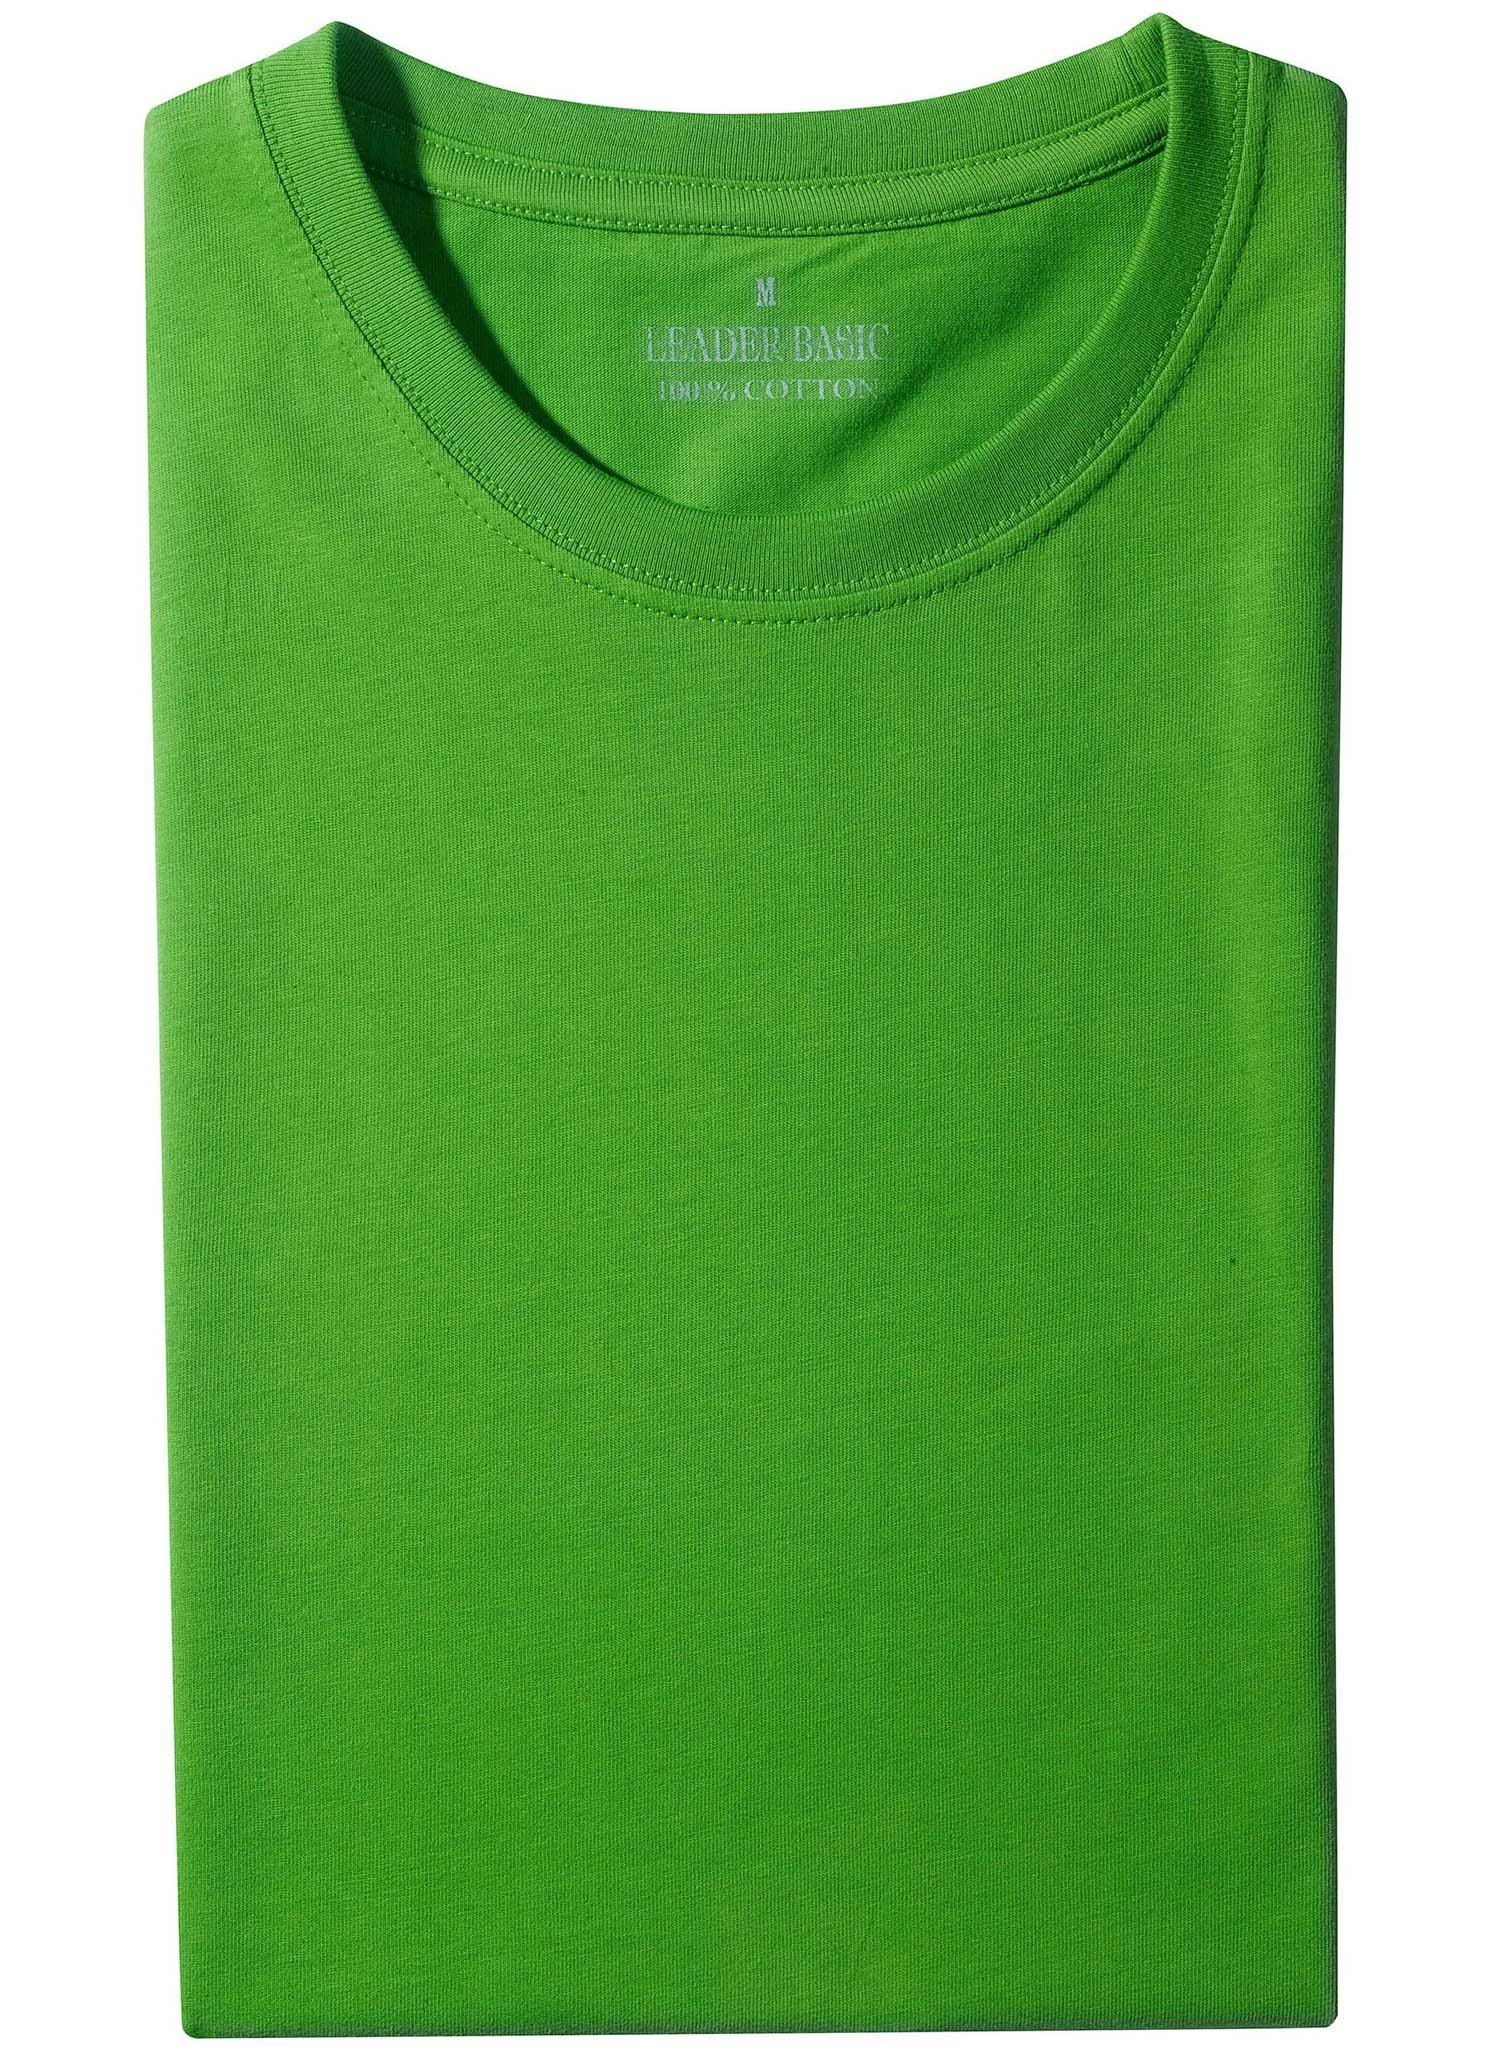 U-Duo-Pack-Shirt grün XXXL 059 - 1 - Ronja.ch